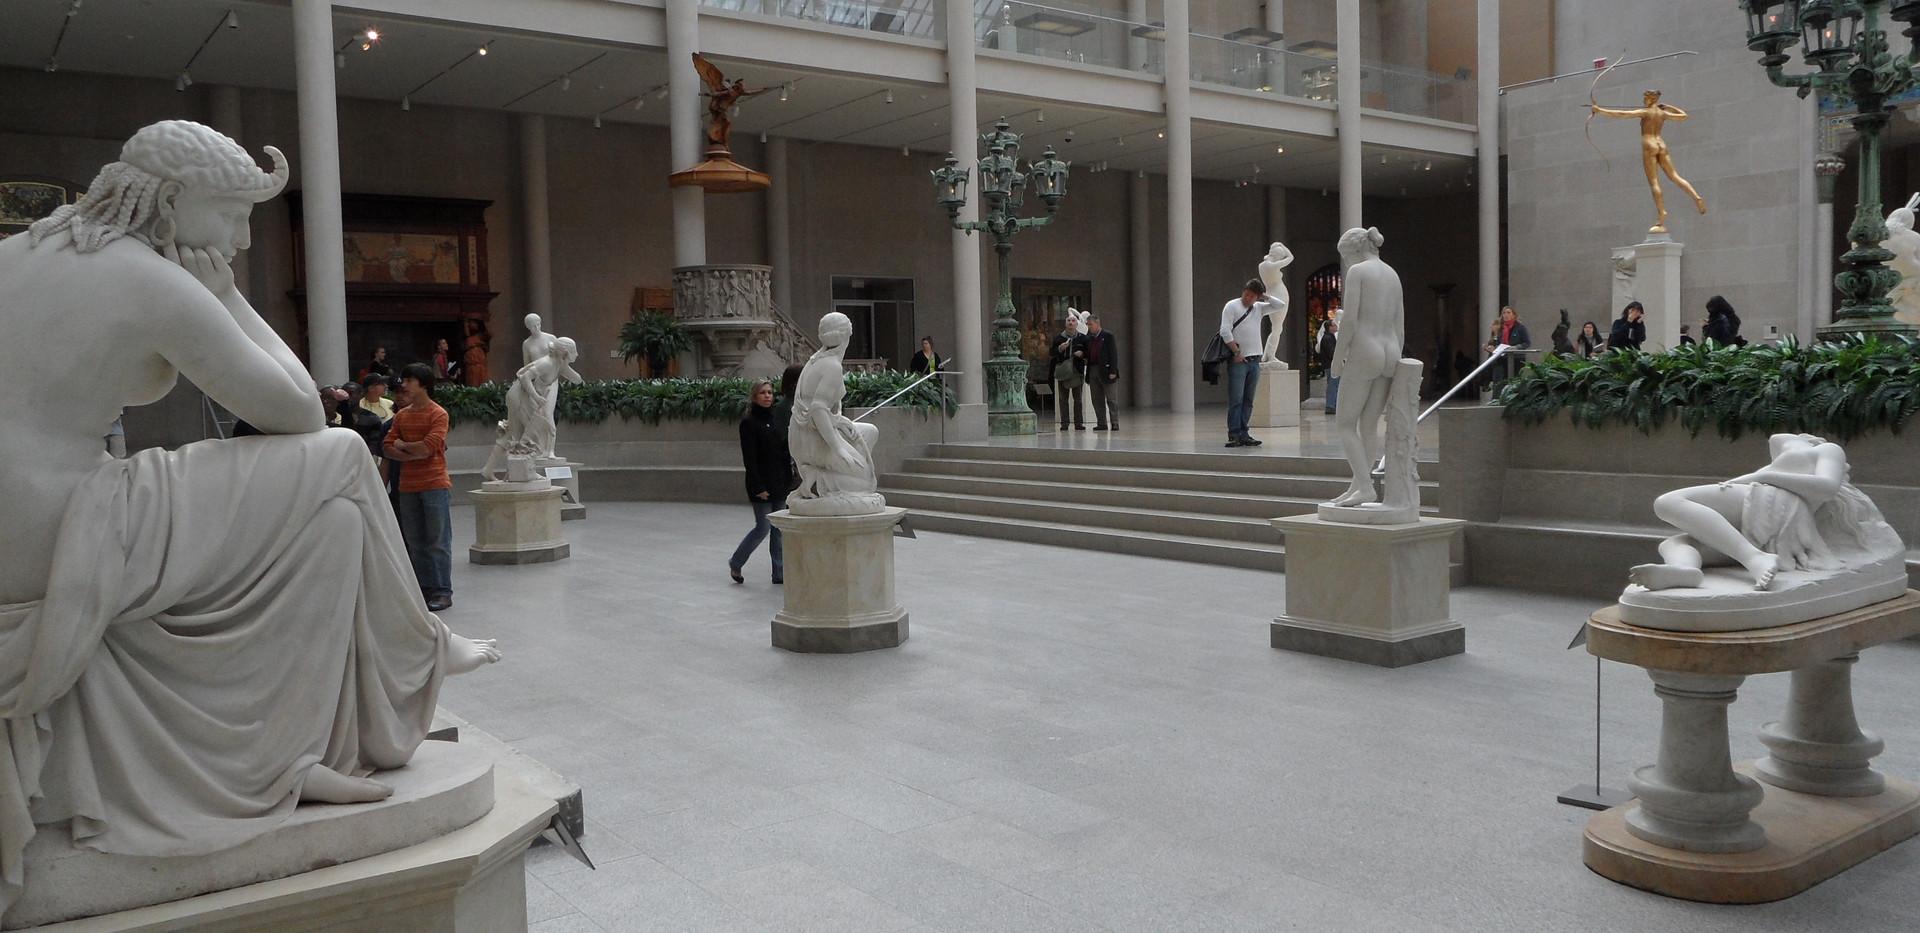 MET (Metropolitan Museum of Art)